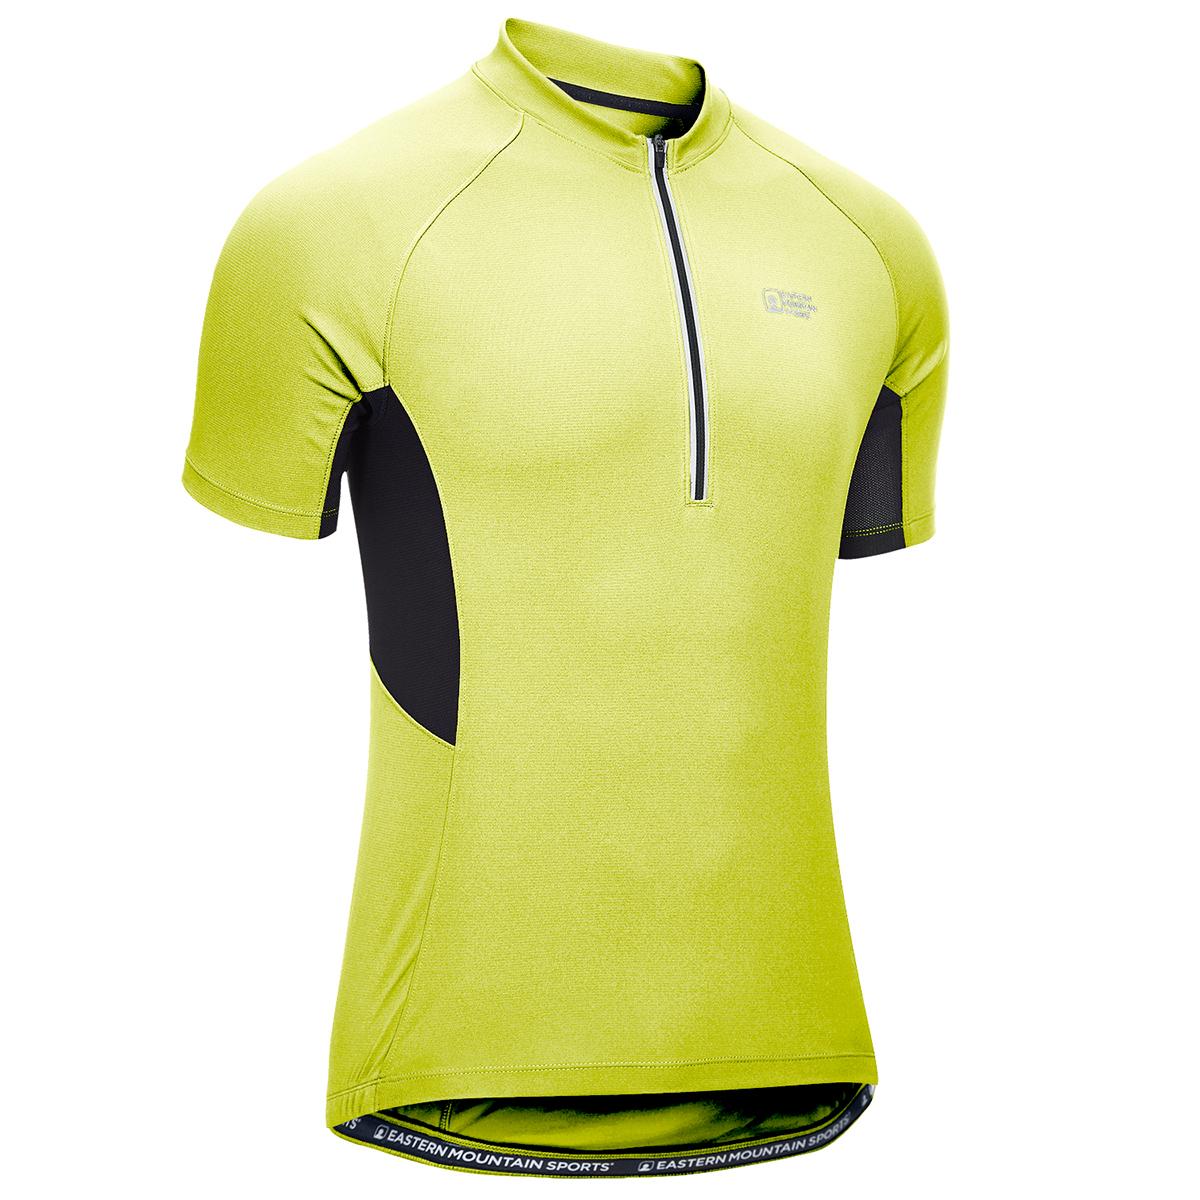 promo code 44f84 7a15a Cycling Equipment & Gear | Bob's Stores